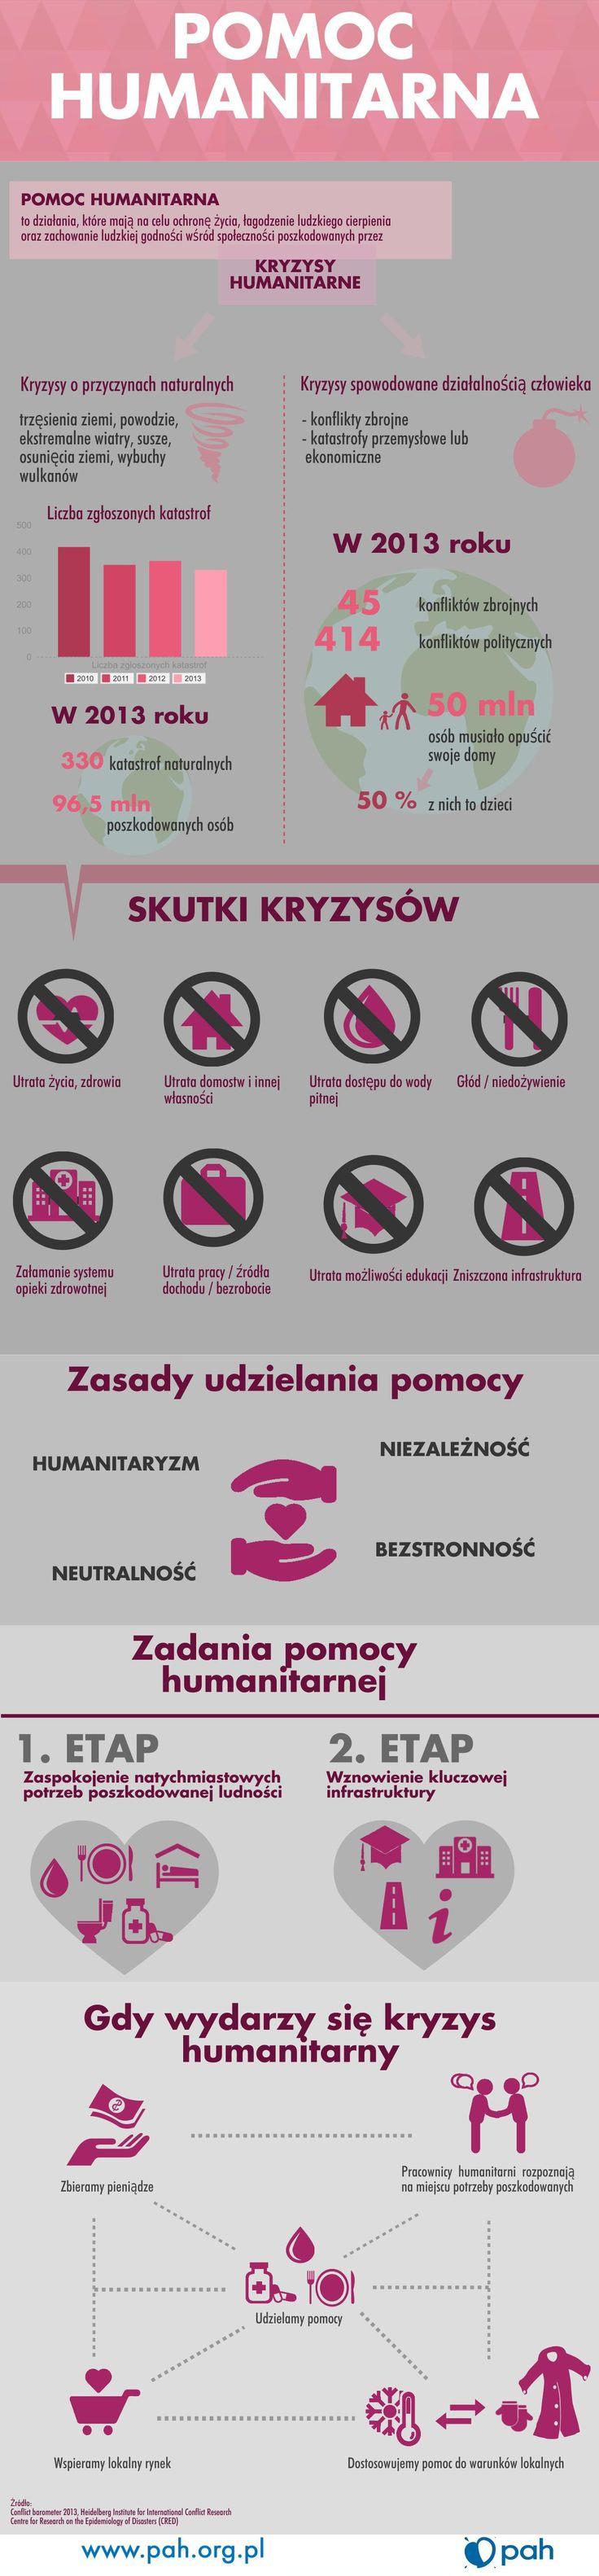 Pomoc humanitarna http://www.pah.org.pl/nasze-dzialania/30/klub_sos